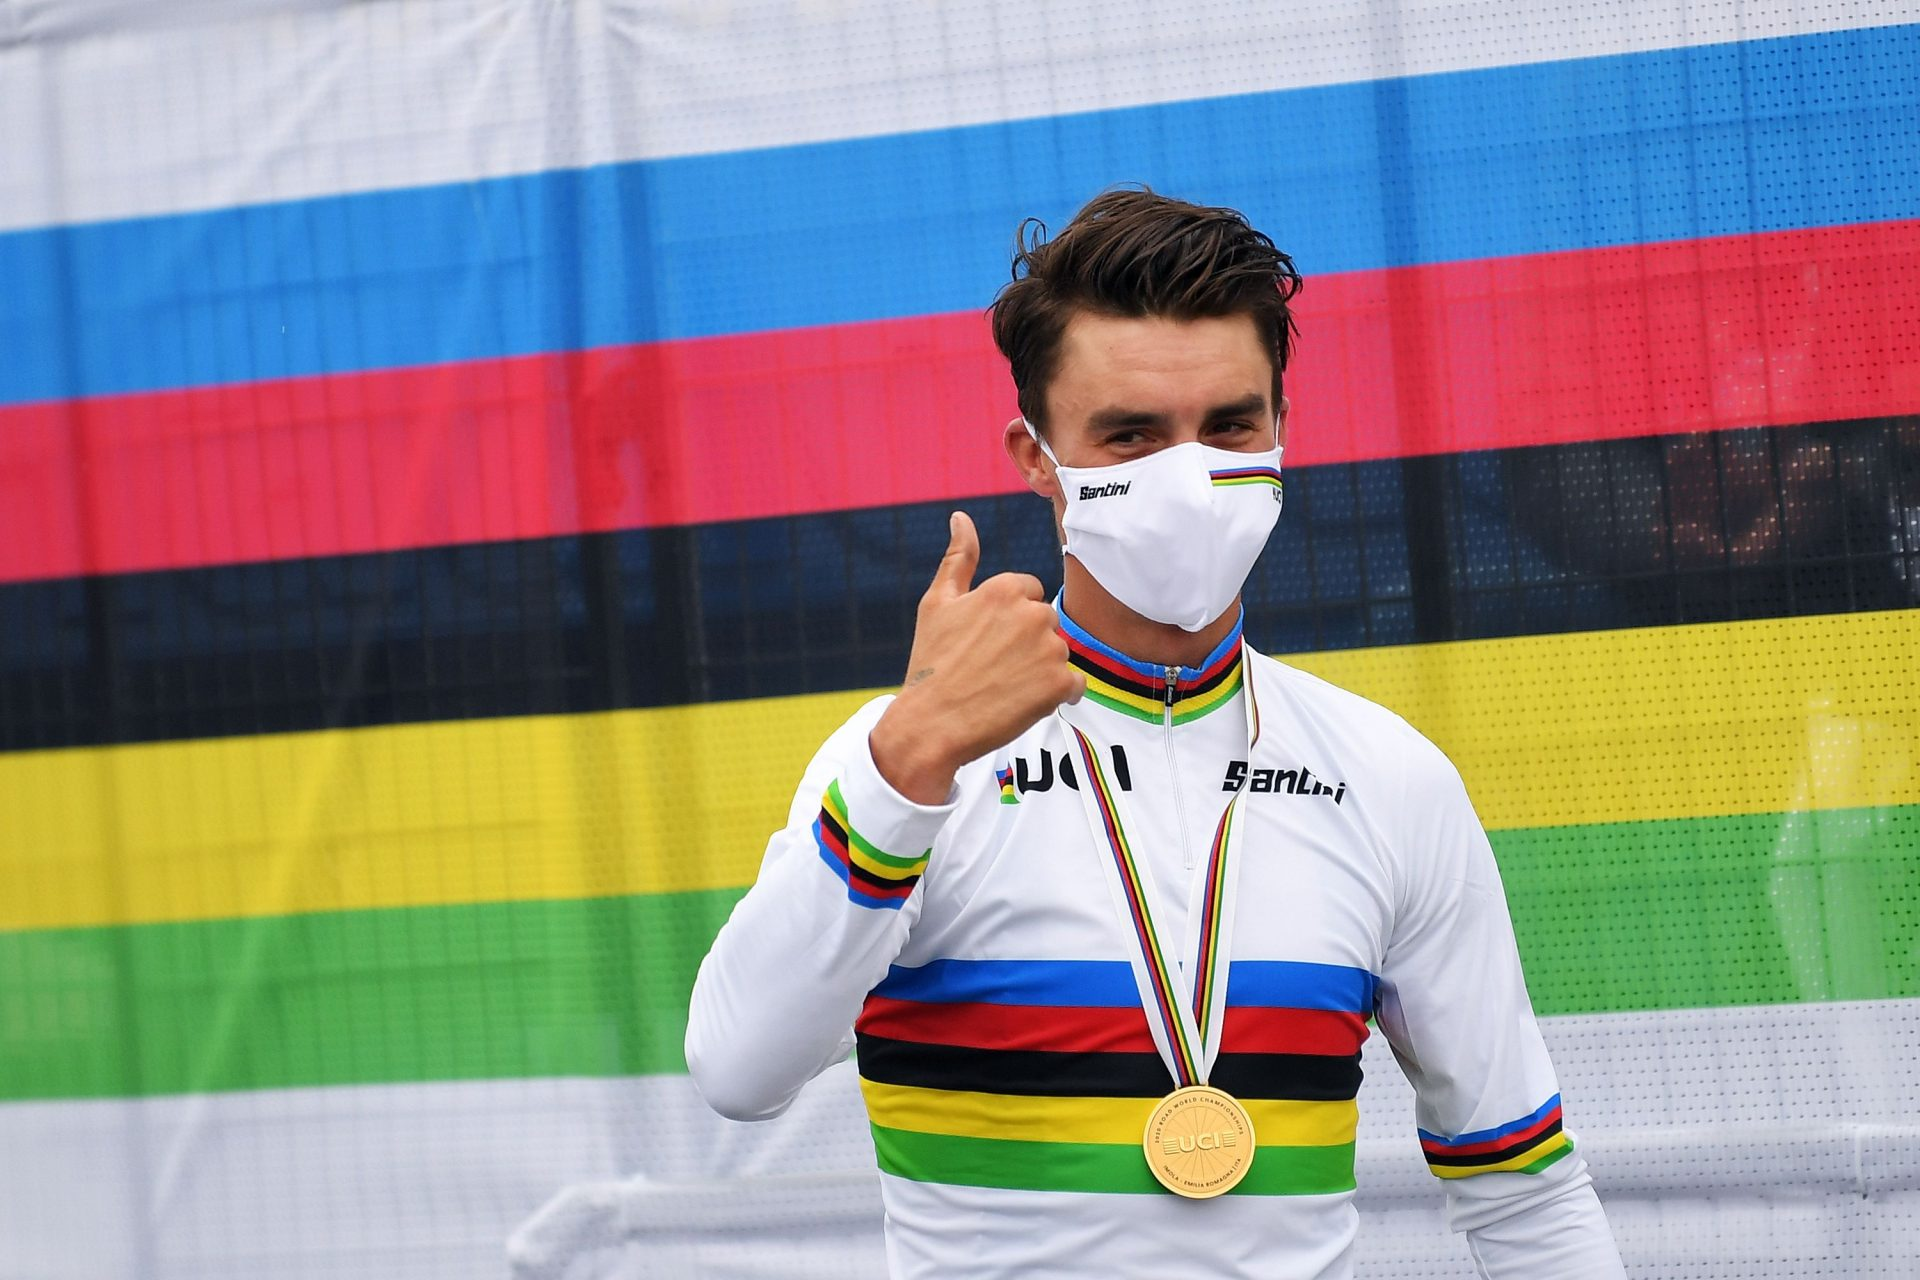 Julian Alaphilippe se zlatou medailí a dresu mistra světa po závodě v Imole. Foto: Tim De Waele/Getty Images/Deceuninck Quick Step